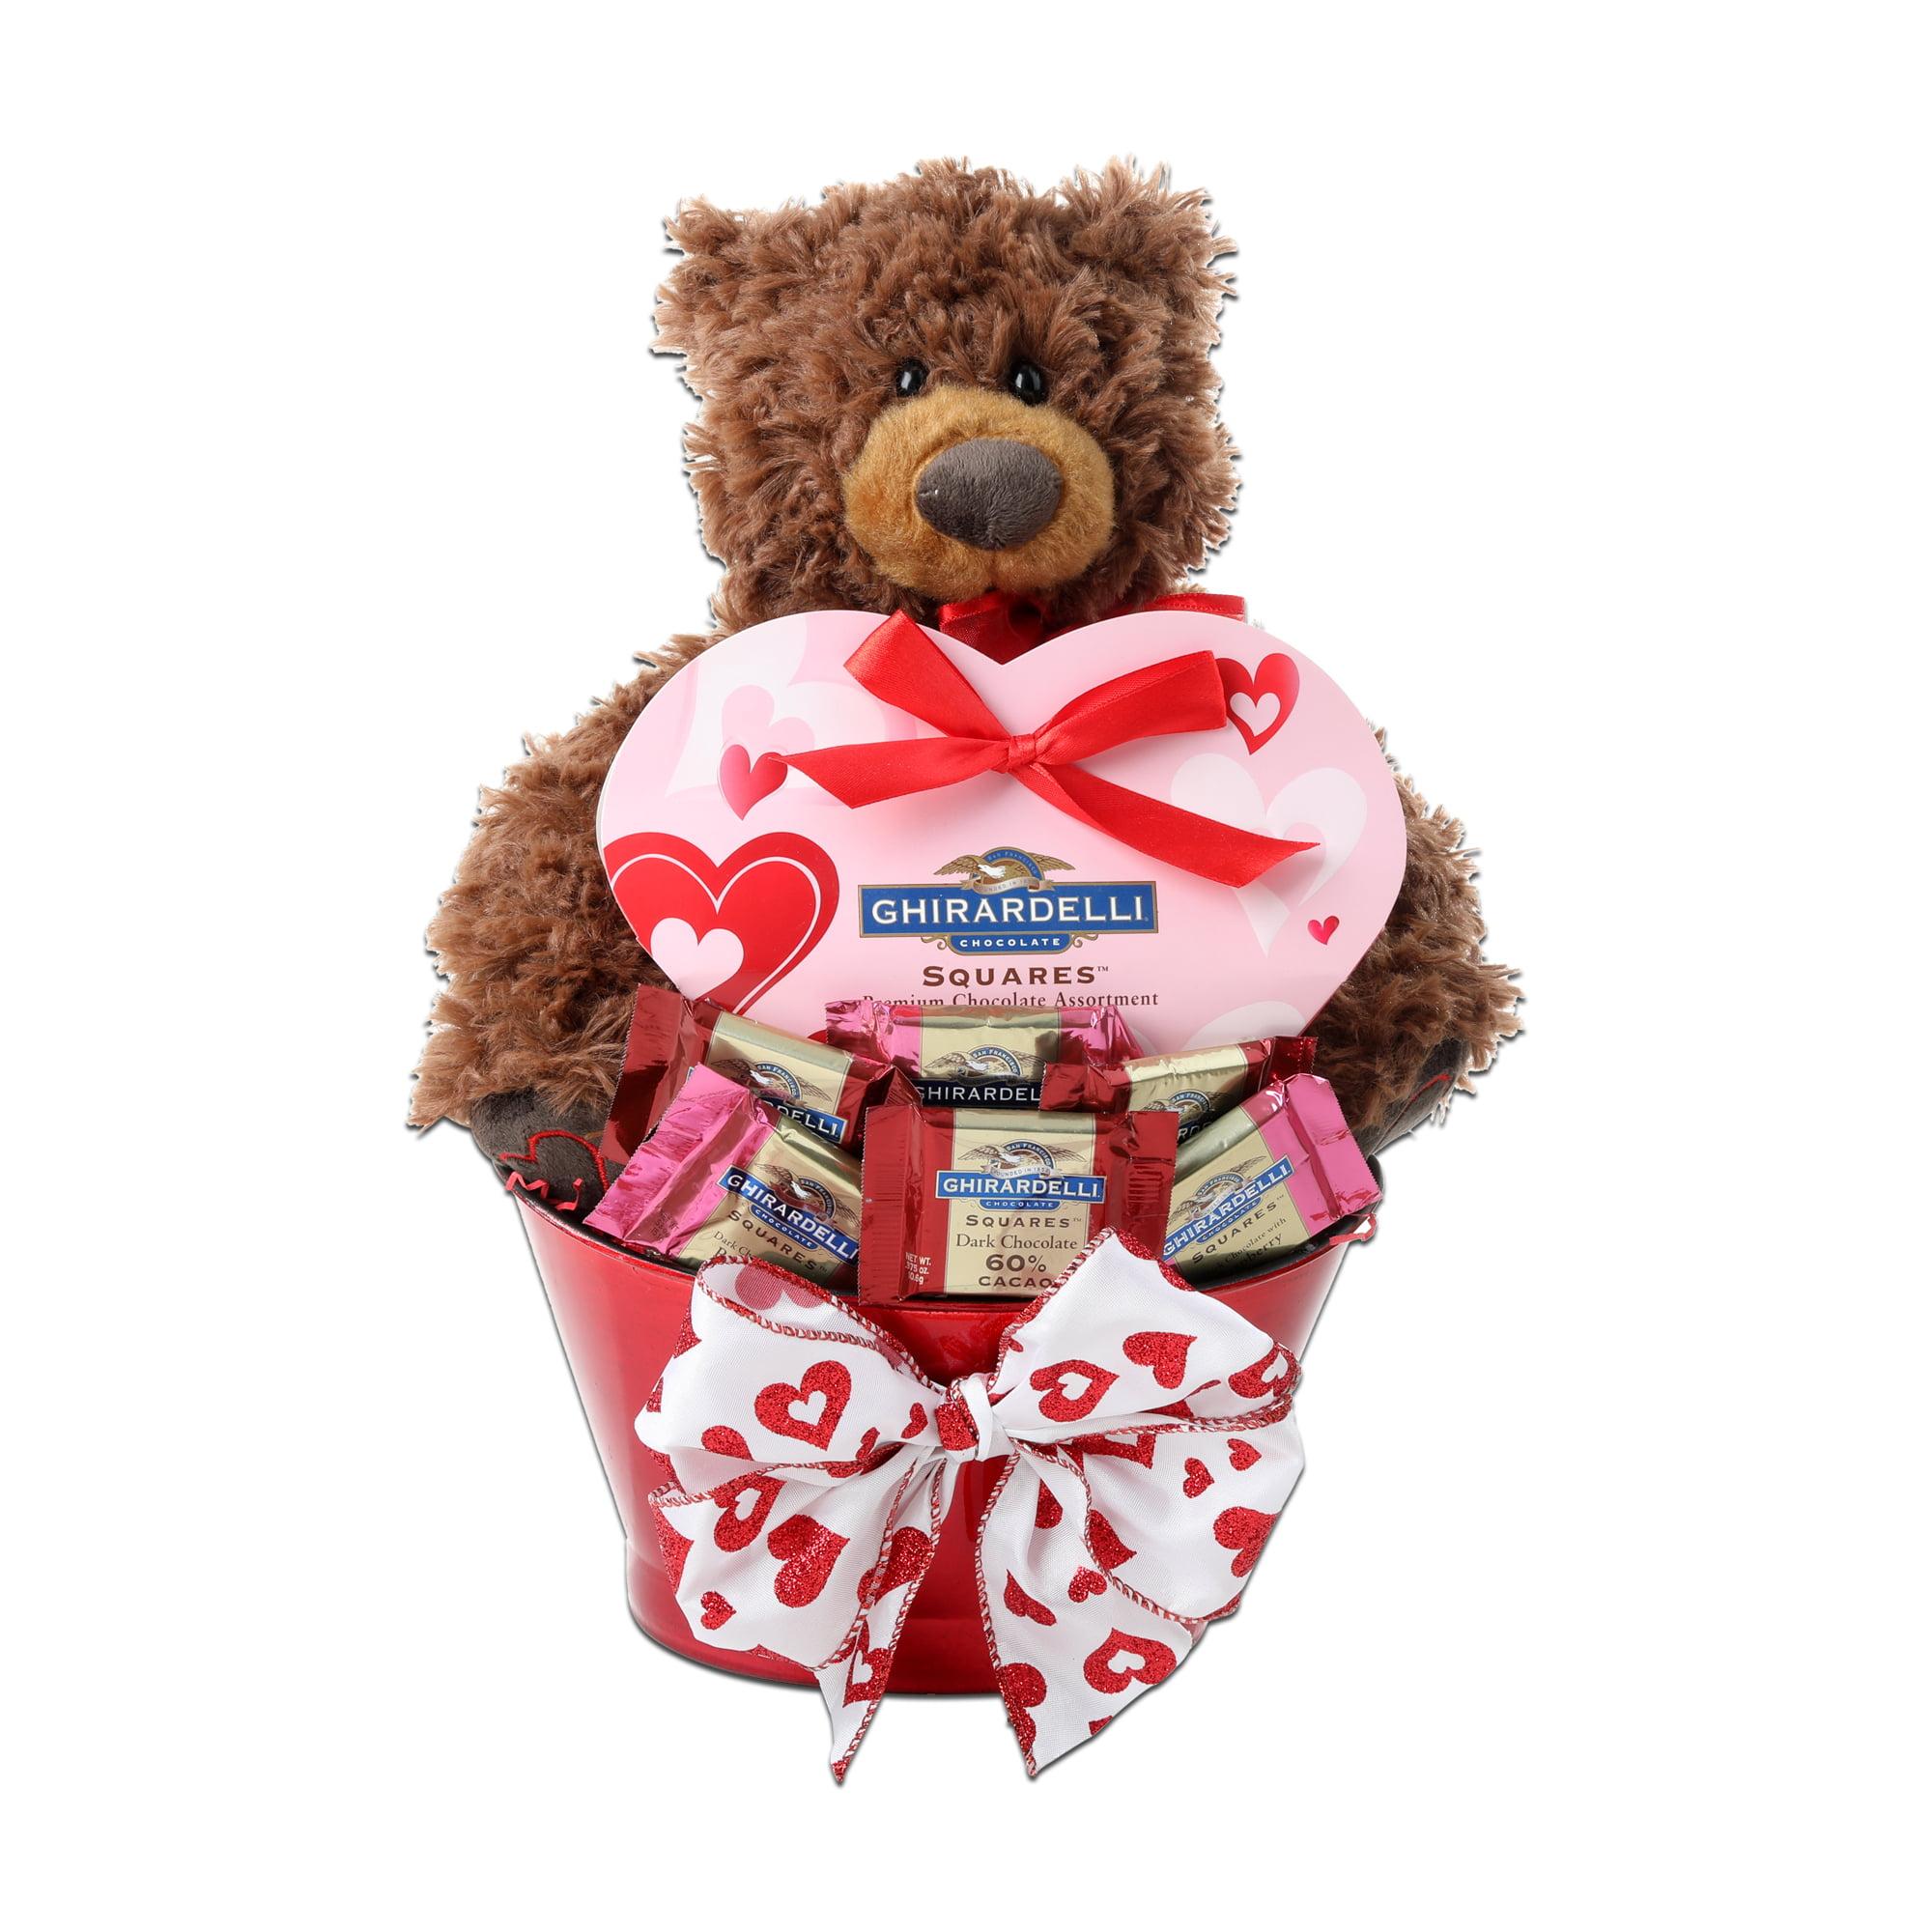 Ghirardelli Chocolate Valentine's Gift